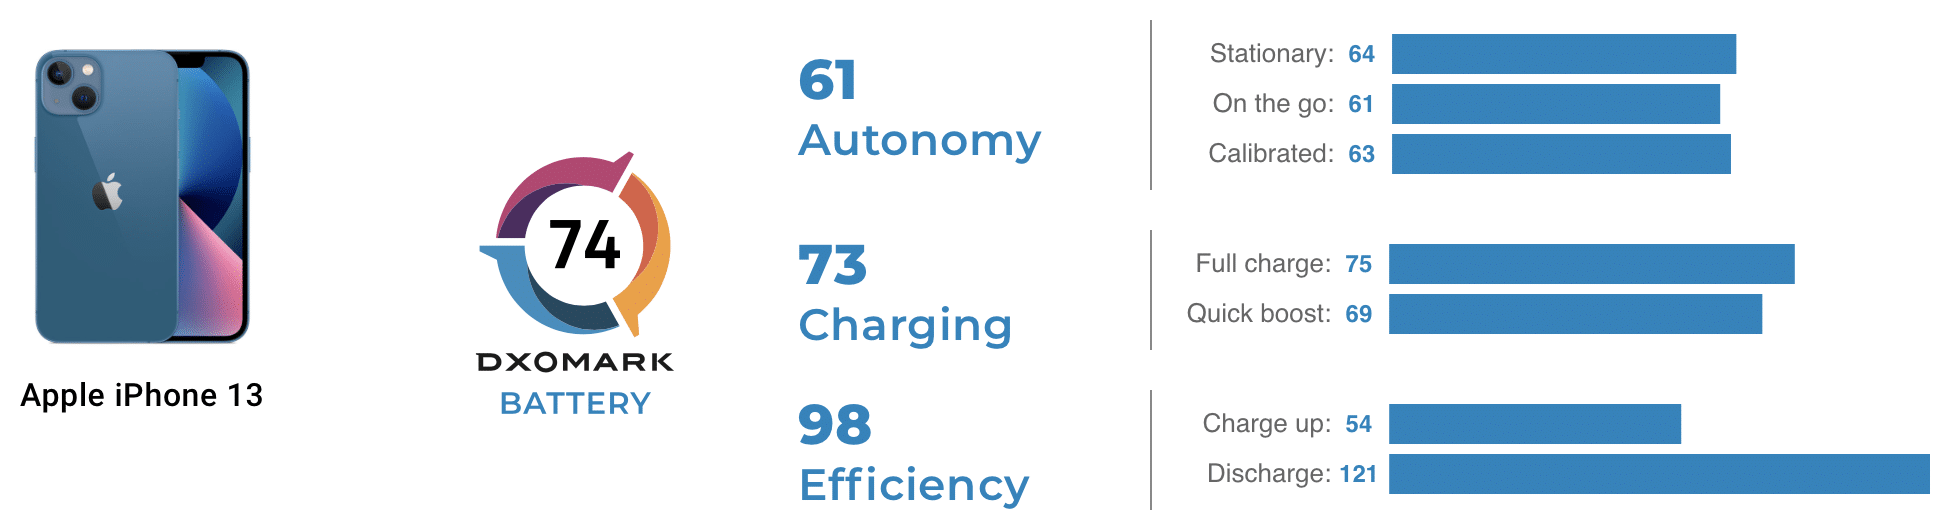 Análise de bateria do iPhone 13 - DXOMARK